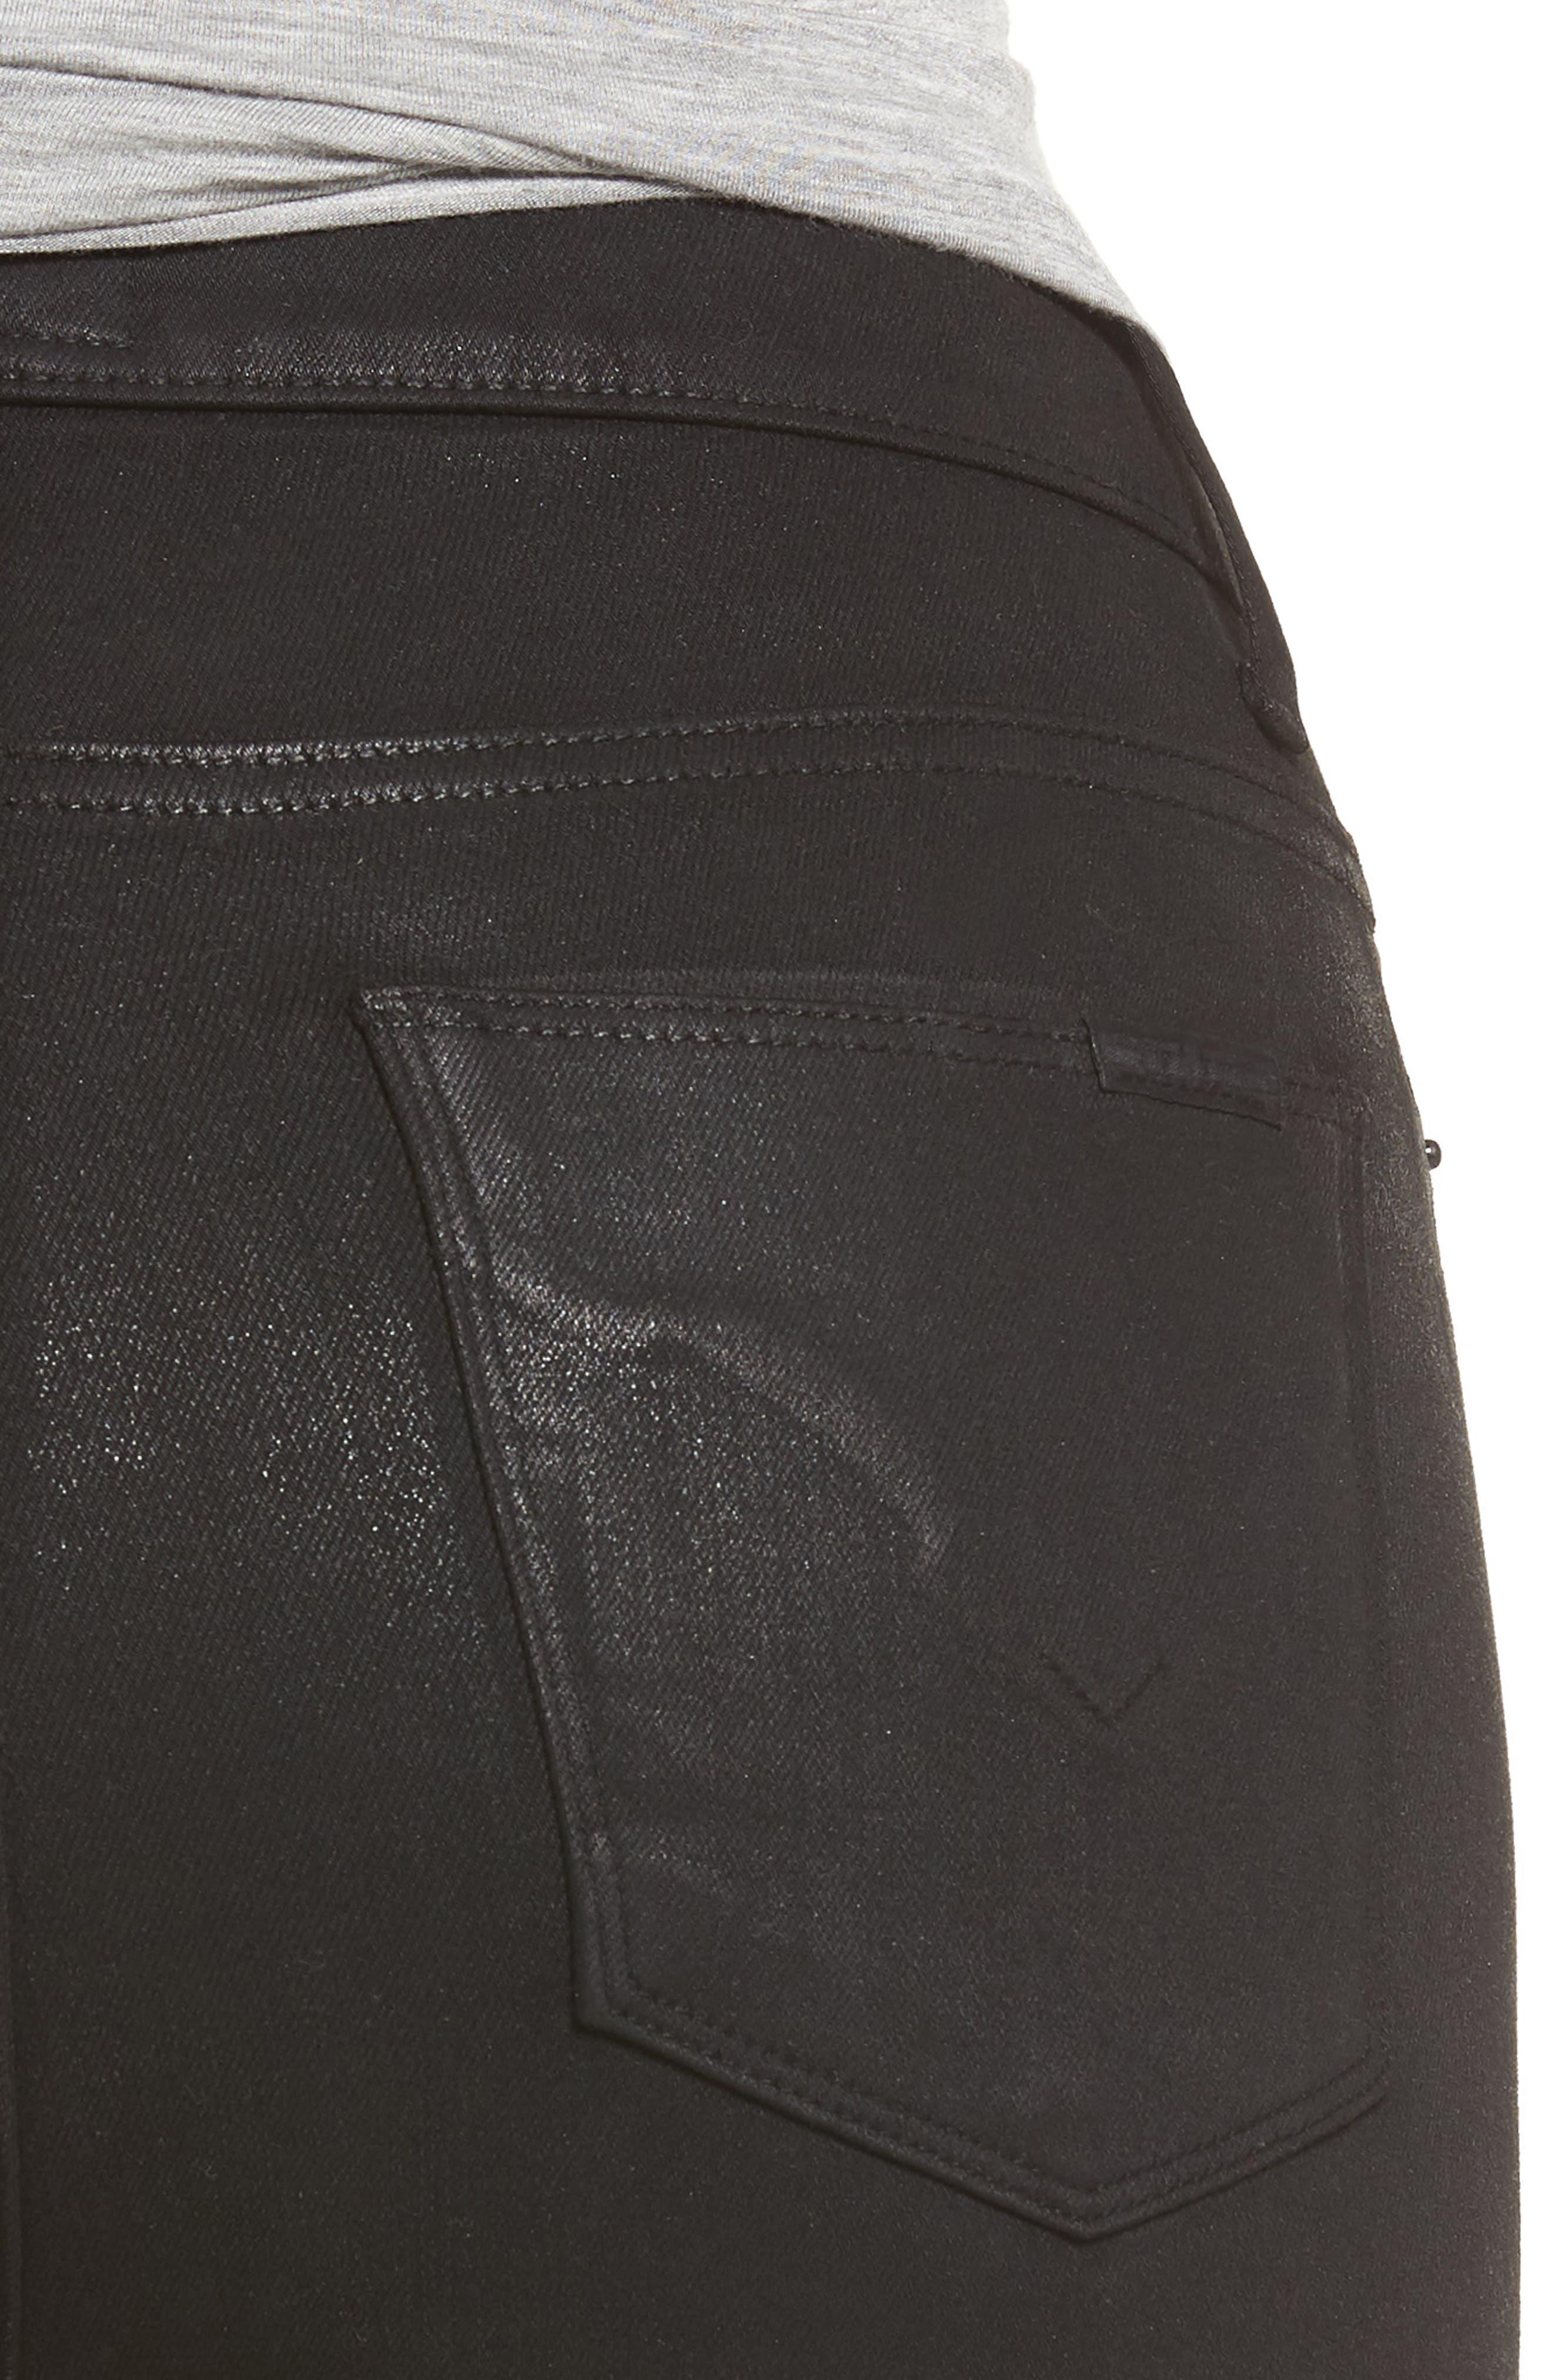 Alternate Image 4  - Hudson Jeans Barbara High Waist Skinny Jeans (Noir Coated)